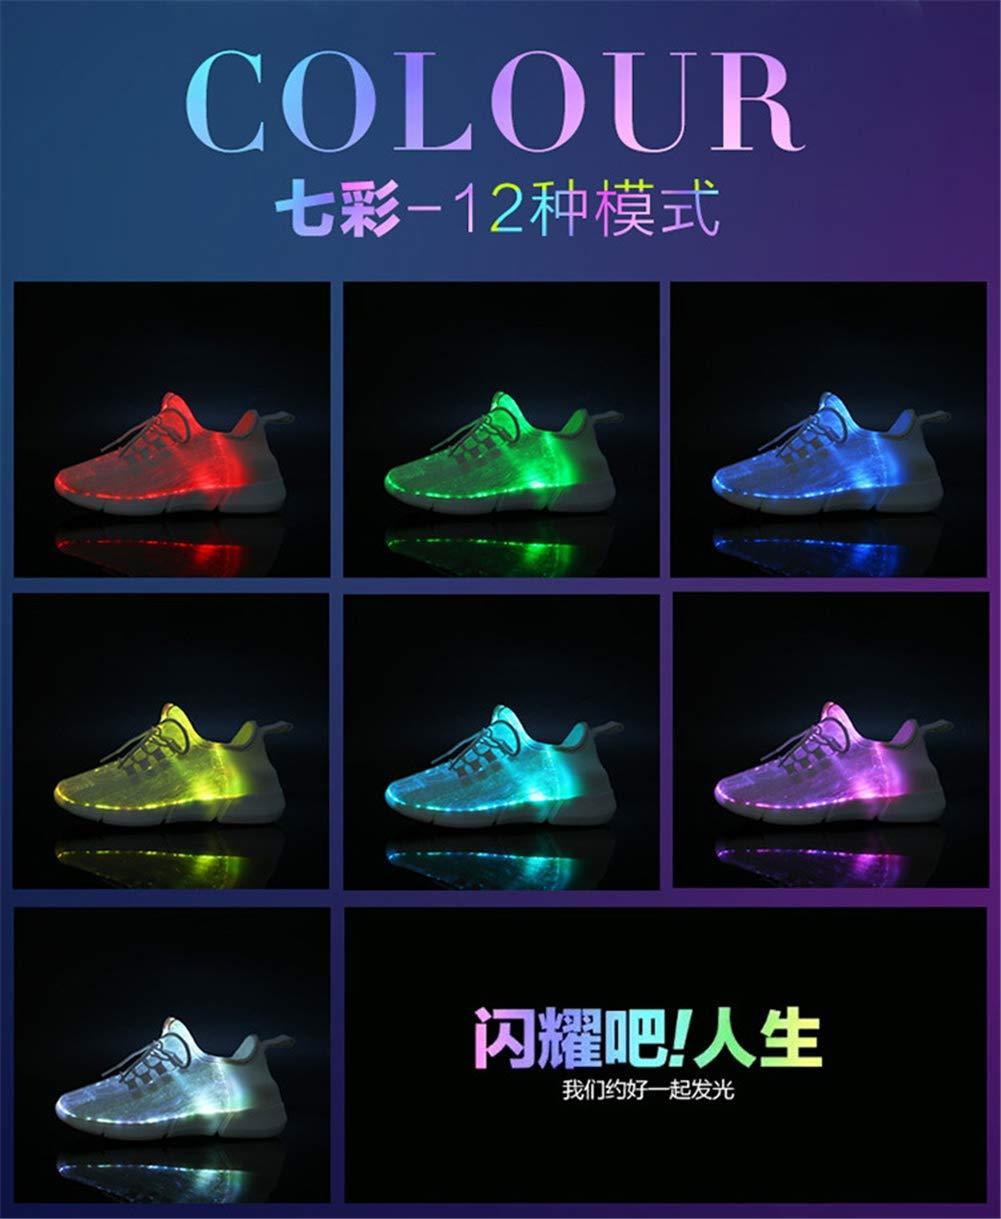 Liebhaber Schuhe, 2019 LED-Lichtschuhe Man damen ' S Casual Casual Casual schuhe USB Charging Farbeful Flash Schuhe Glowing schuhe,Weiß,35 B07NMSLDNZ Sport- & Outdoorschuhe Schnäppchen c083e1